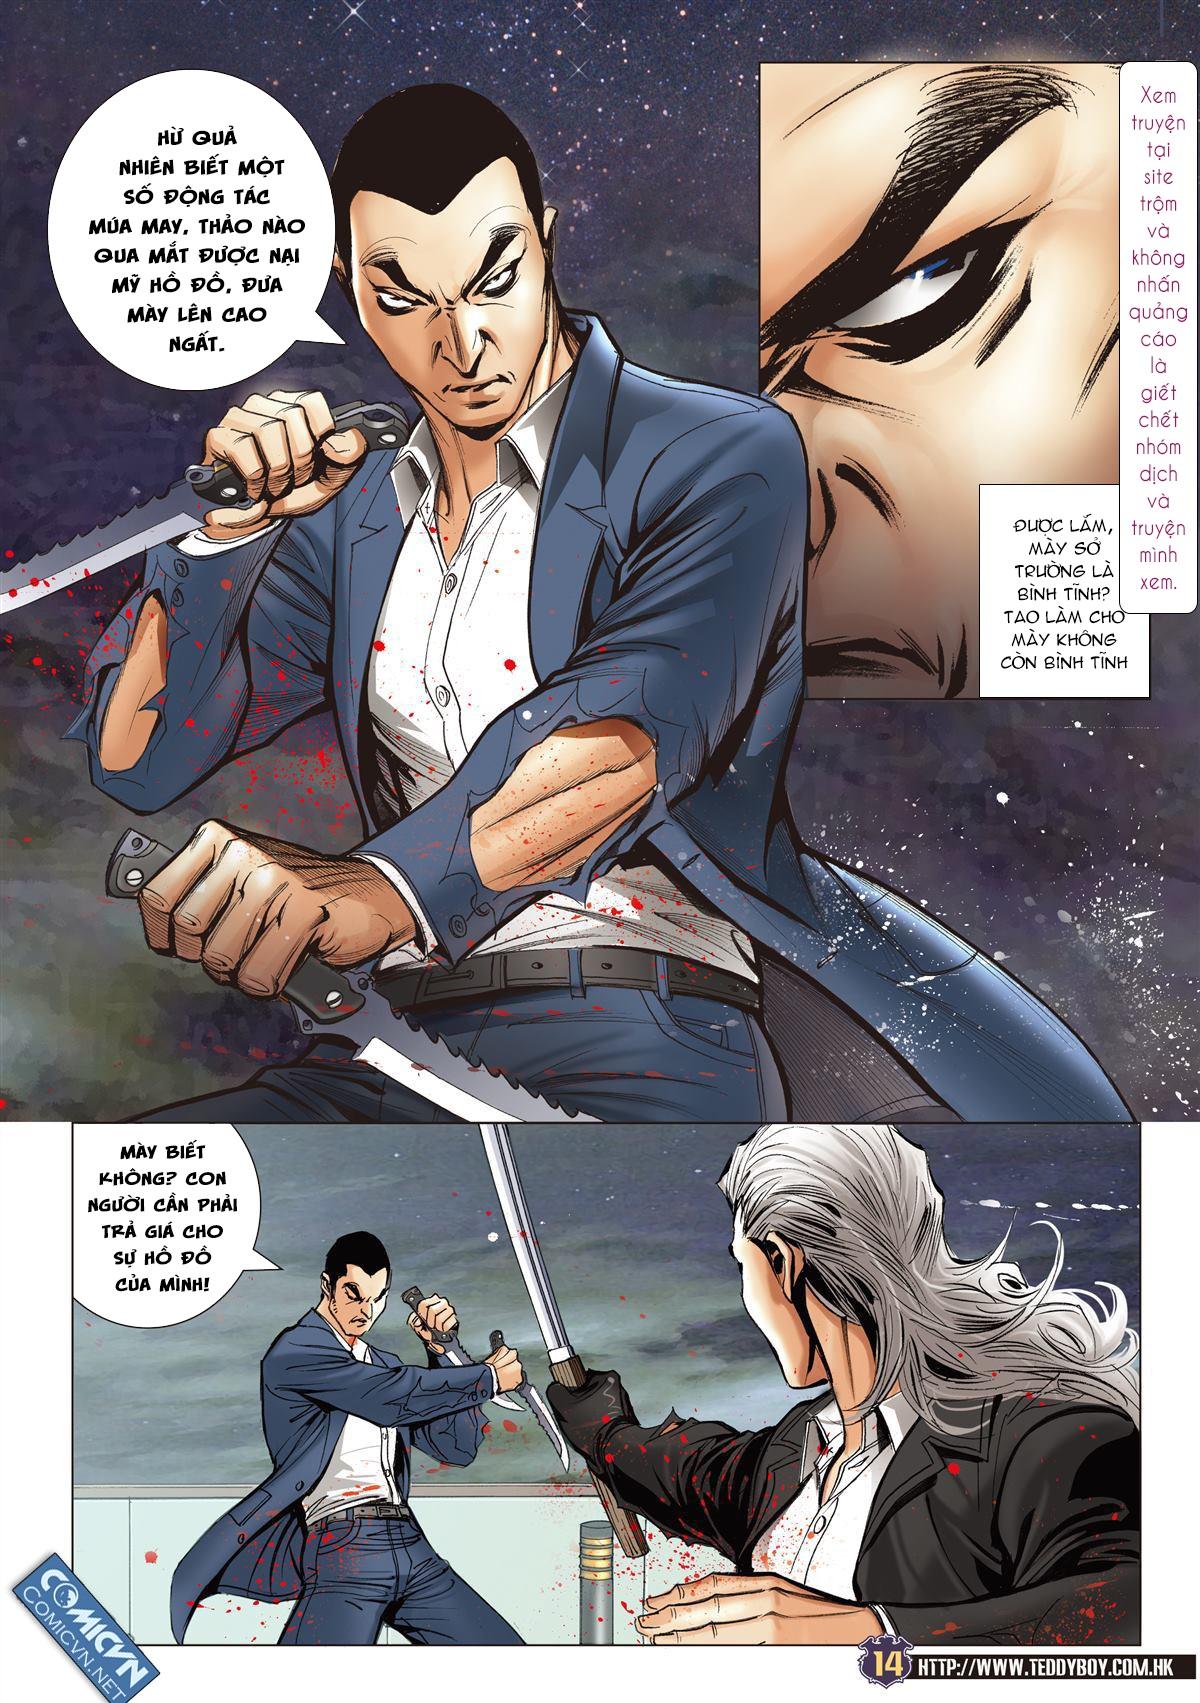 Người Trong Giang Hồ chapter 2078: tranh bảng xếp hạng trang 12